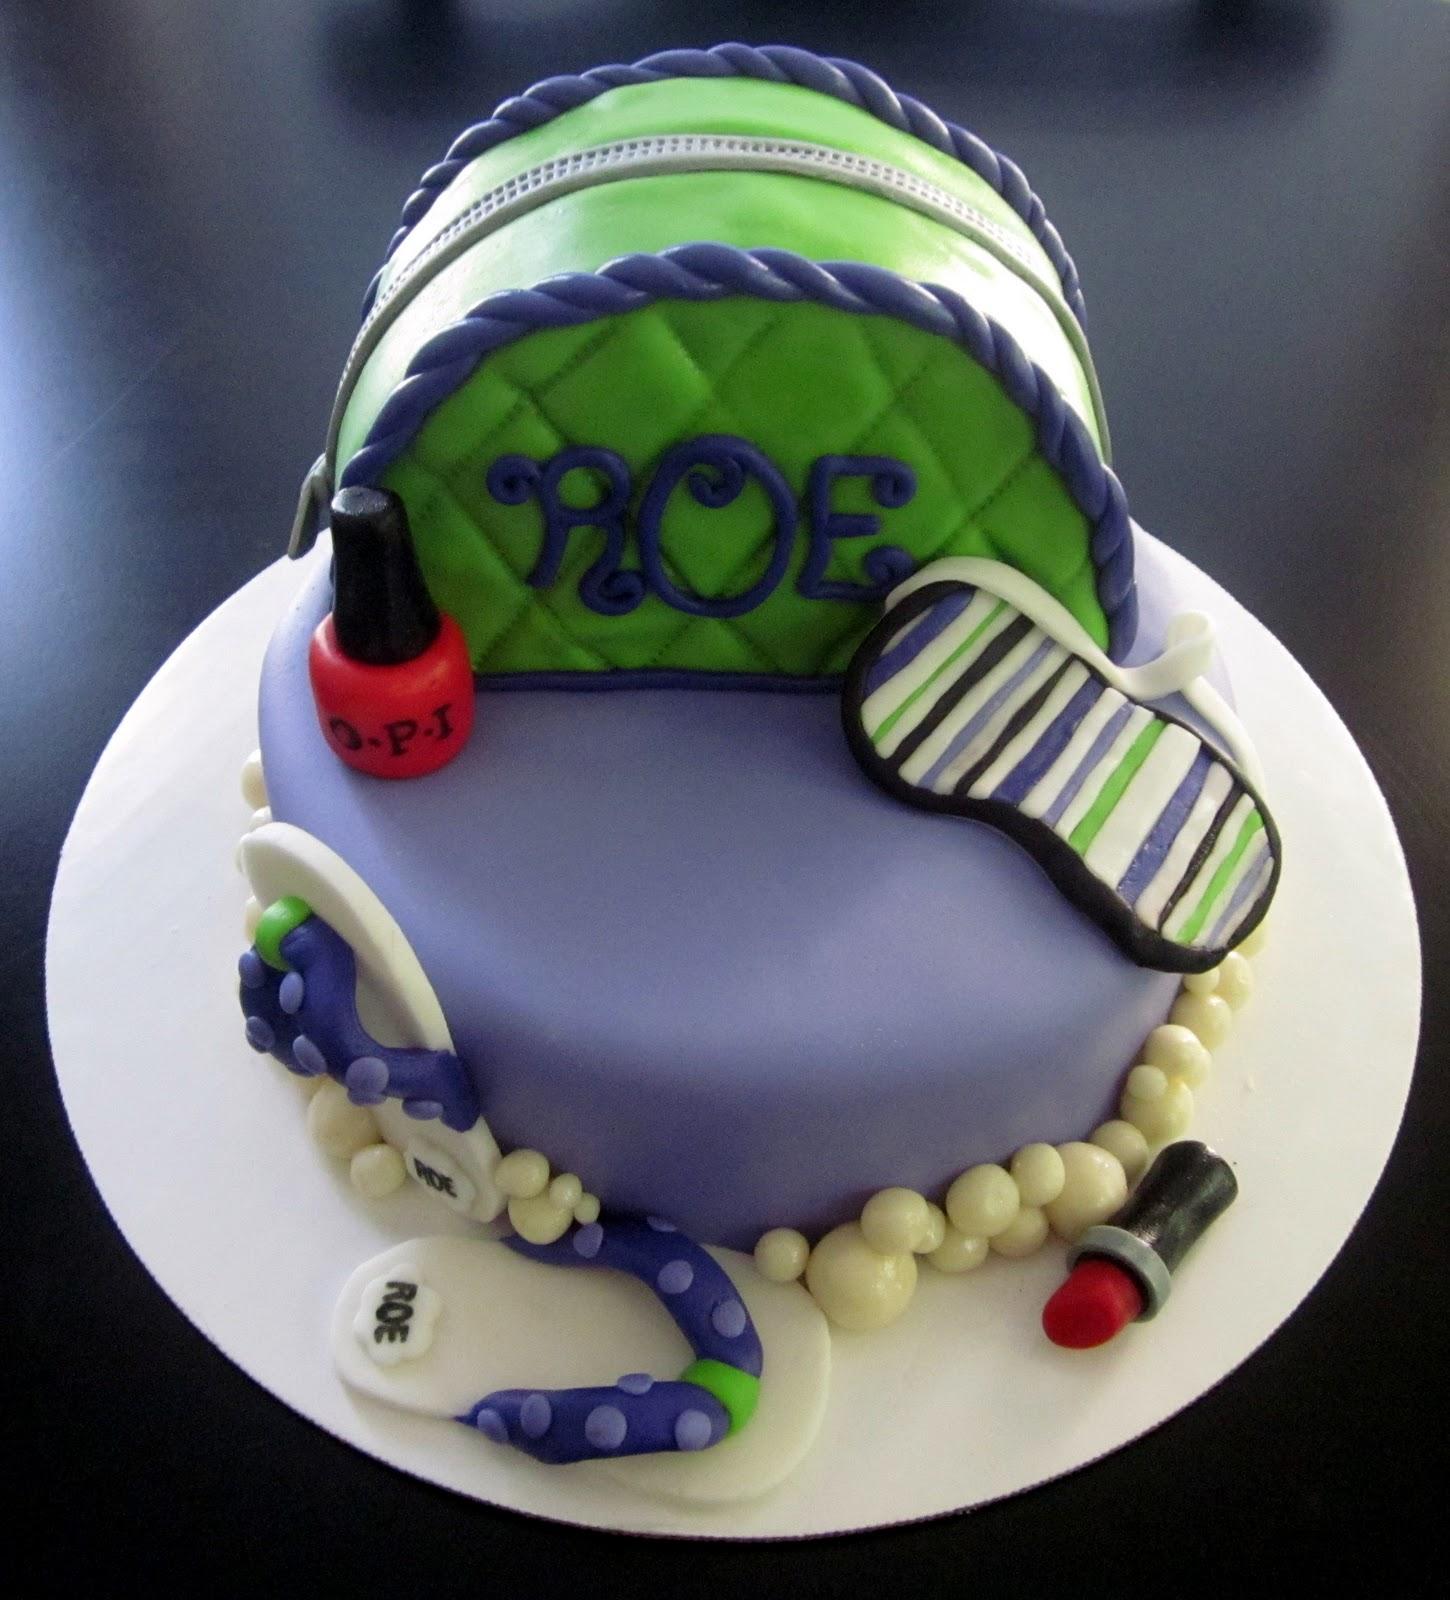 Darlin Designs Spa Birthday Cake